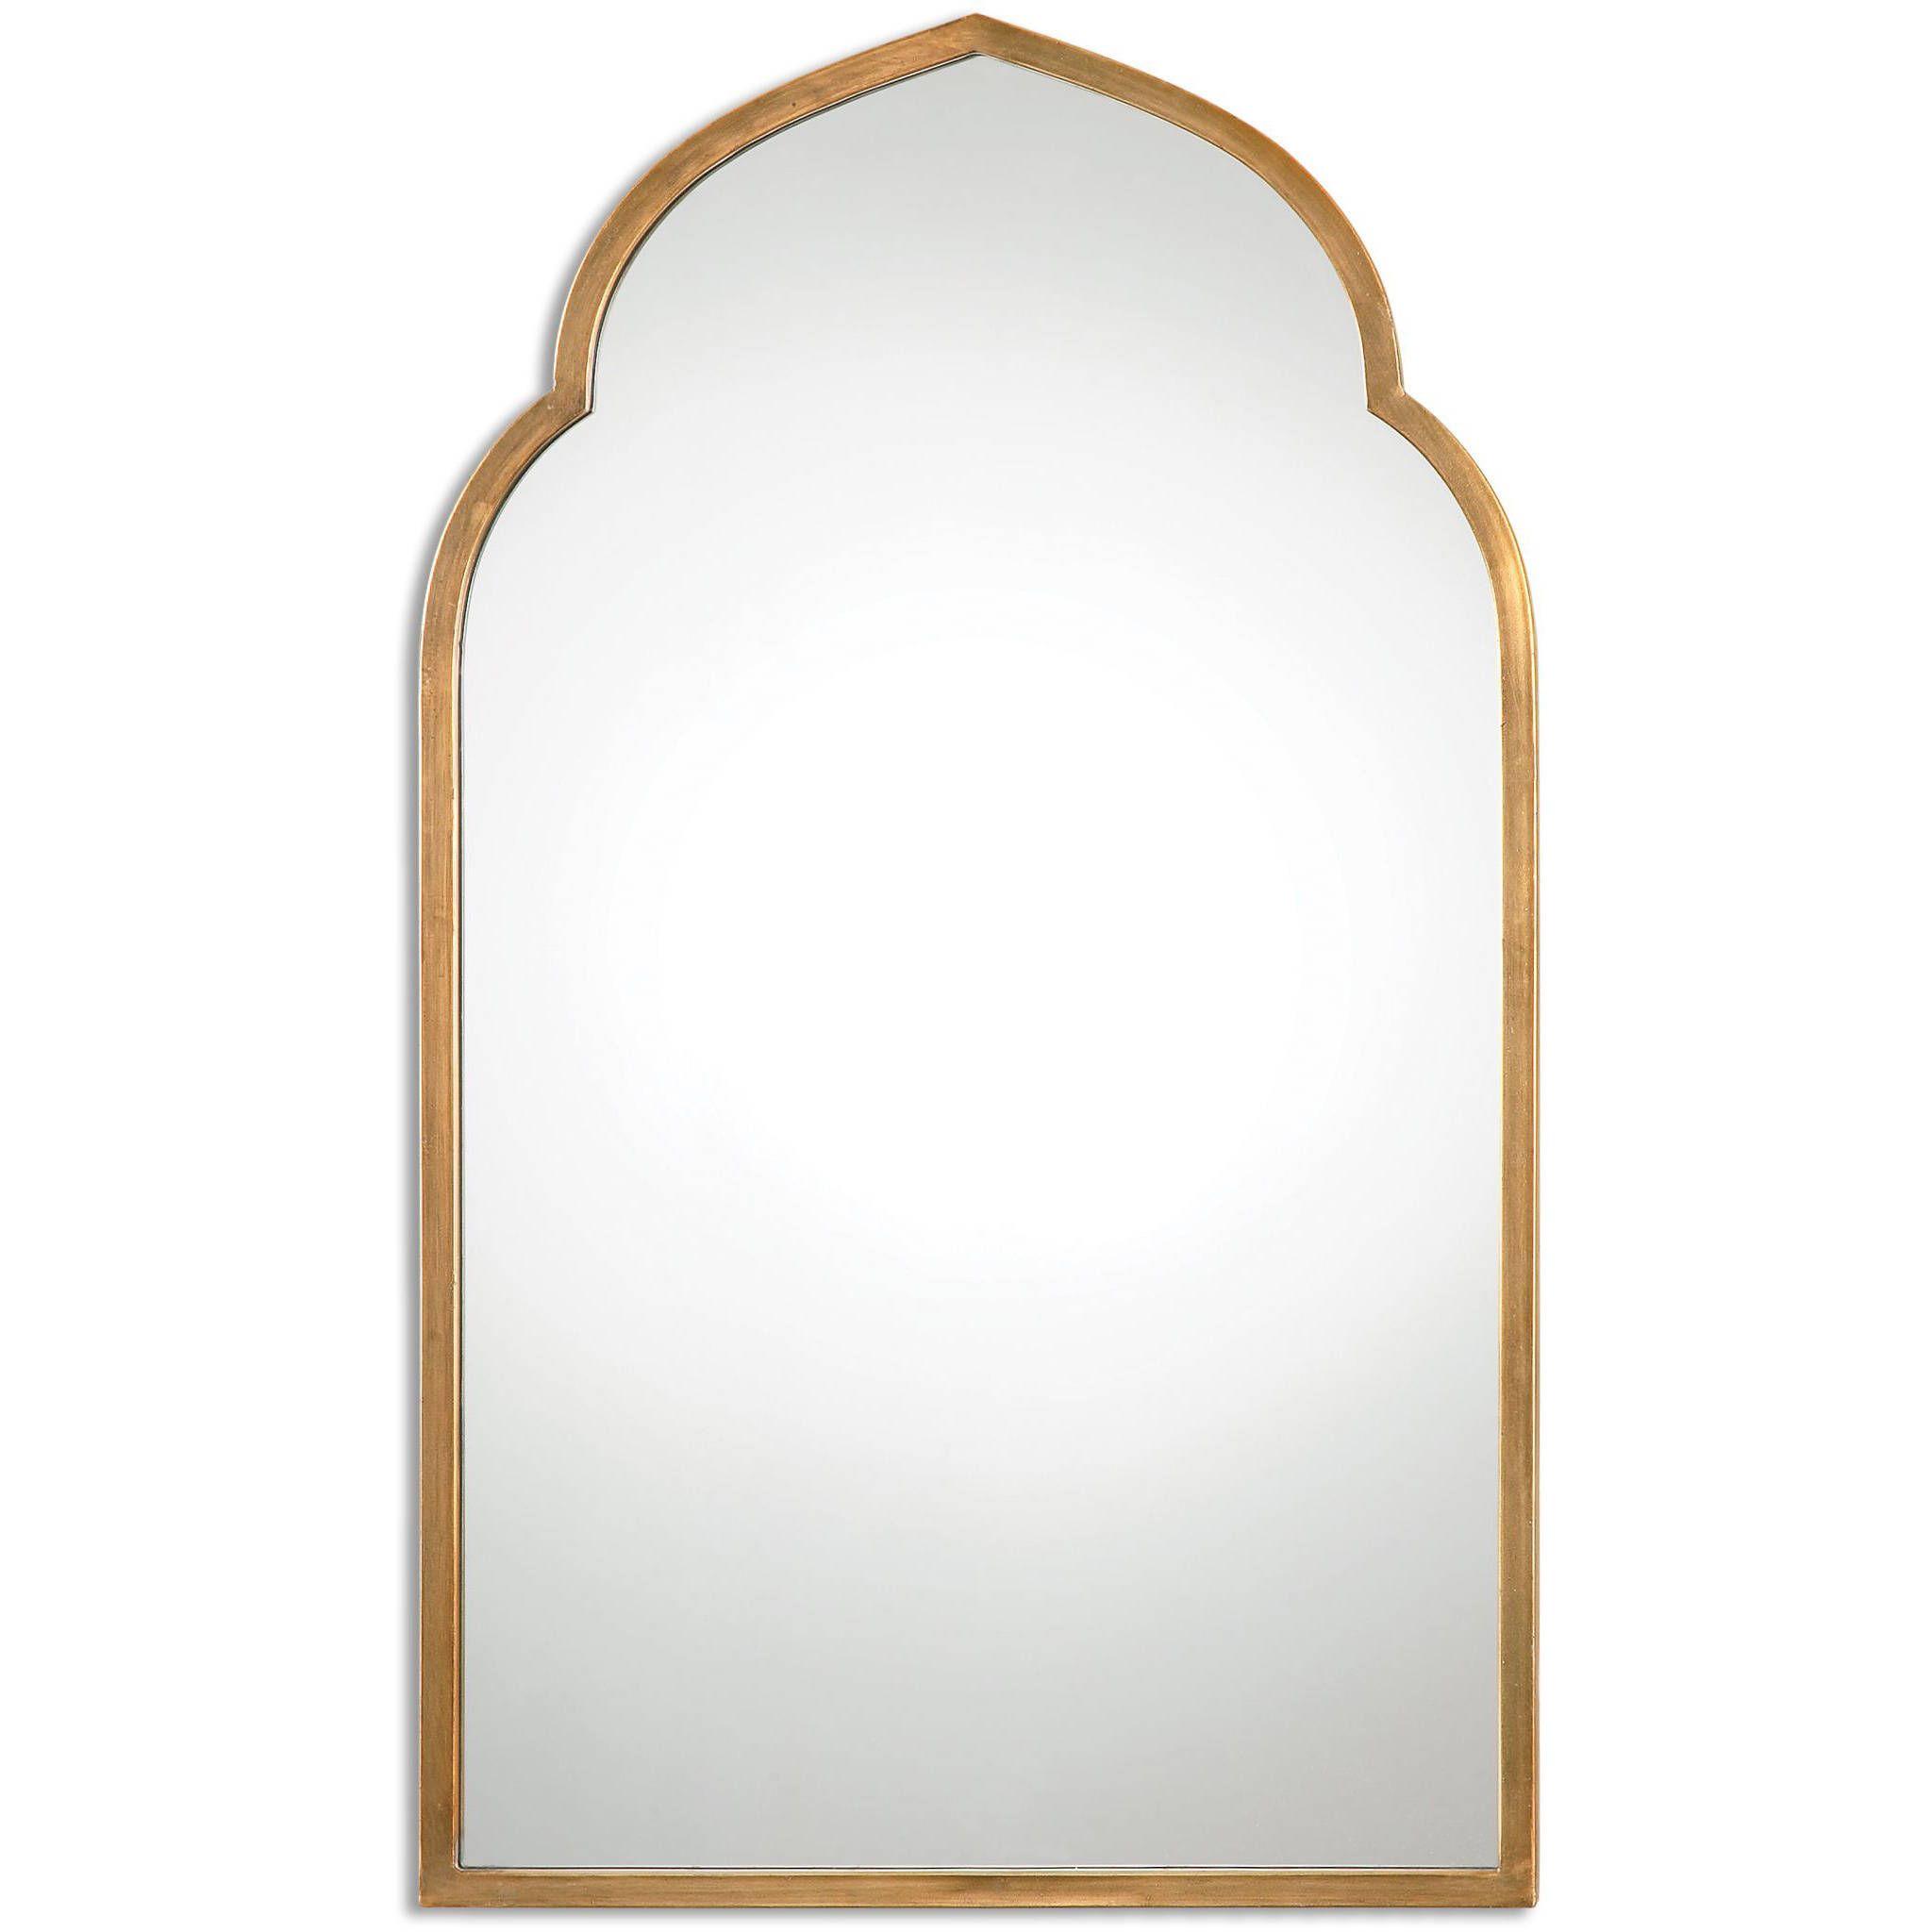 Uttermost Kenitra Gold Arch Decorative Wall Mirror | Overstock.com ...